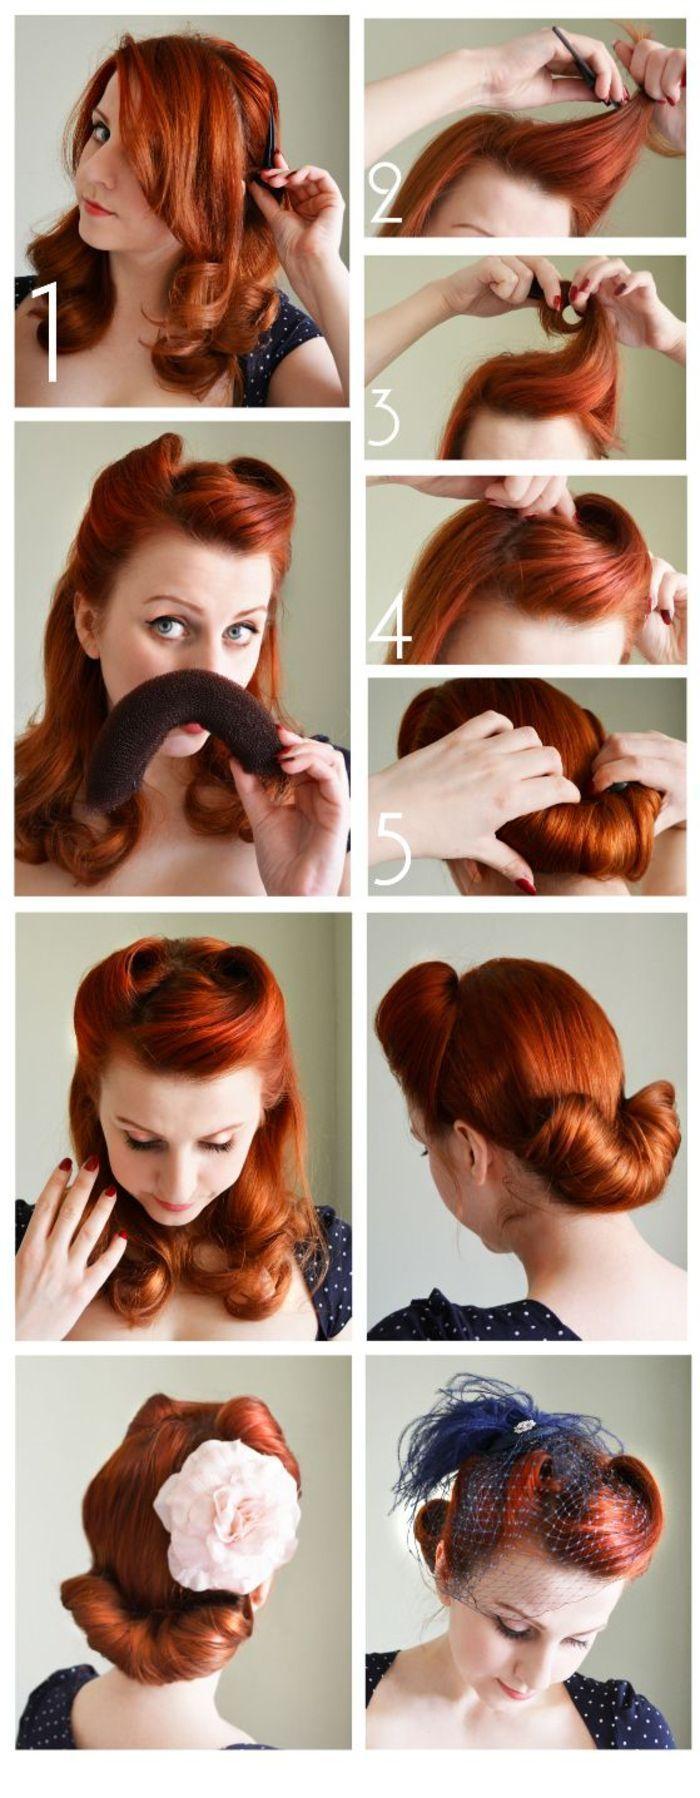 La coiffure rockabilly dans le look de la femme moderne